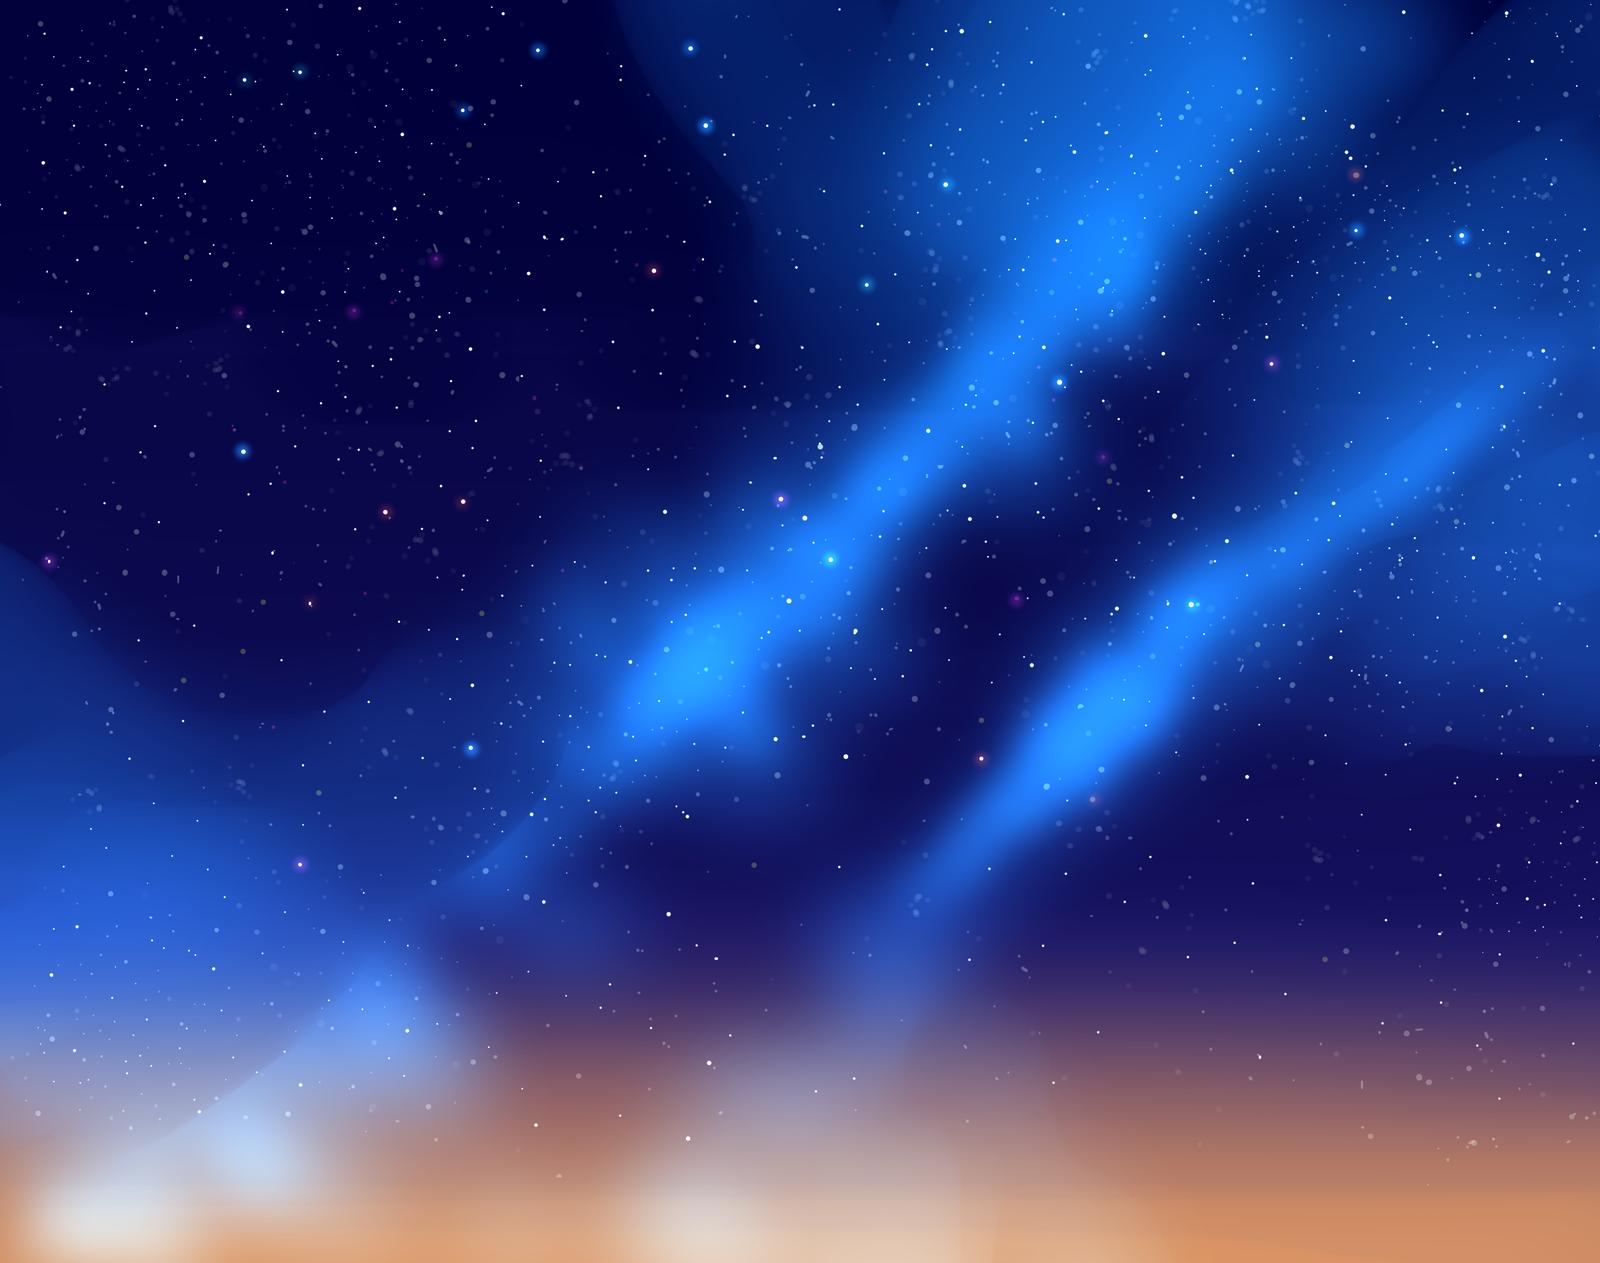 Background - Starry Sky by SweetSilvy Background - Starry Sky by SweetSilvy - Starry Sky Background PNG